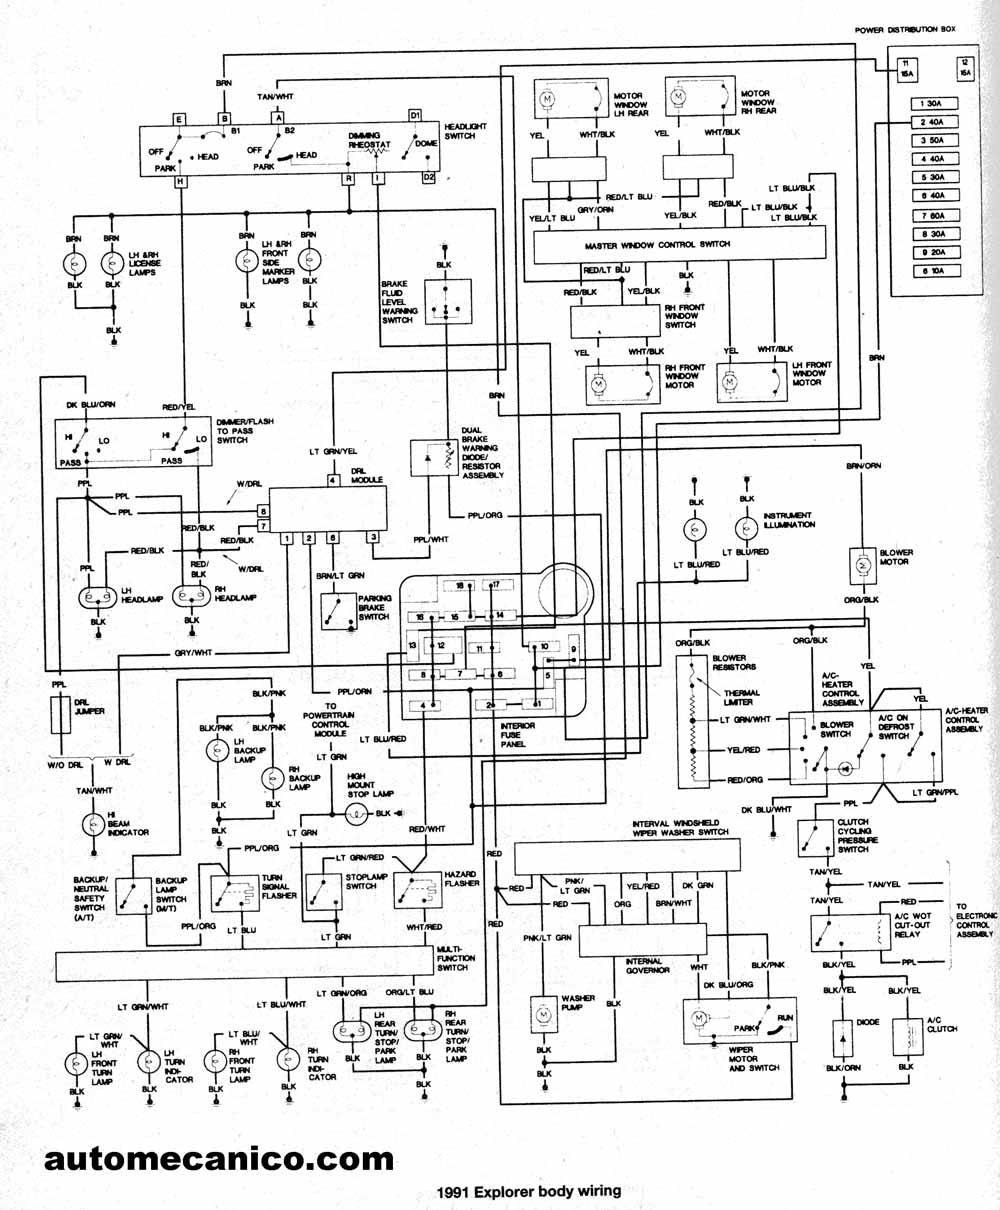 automecanico ford